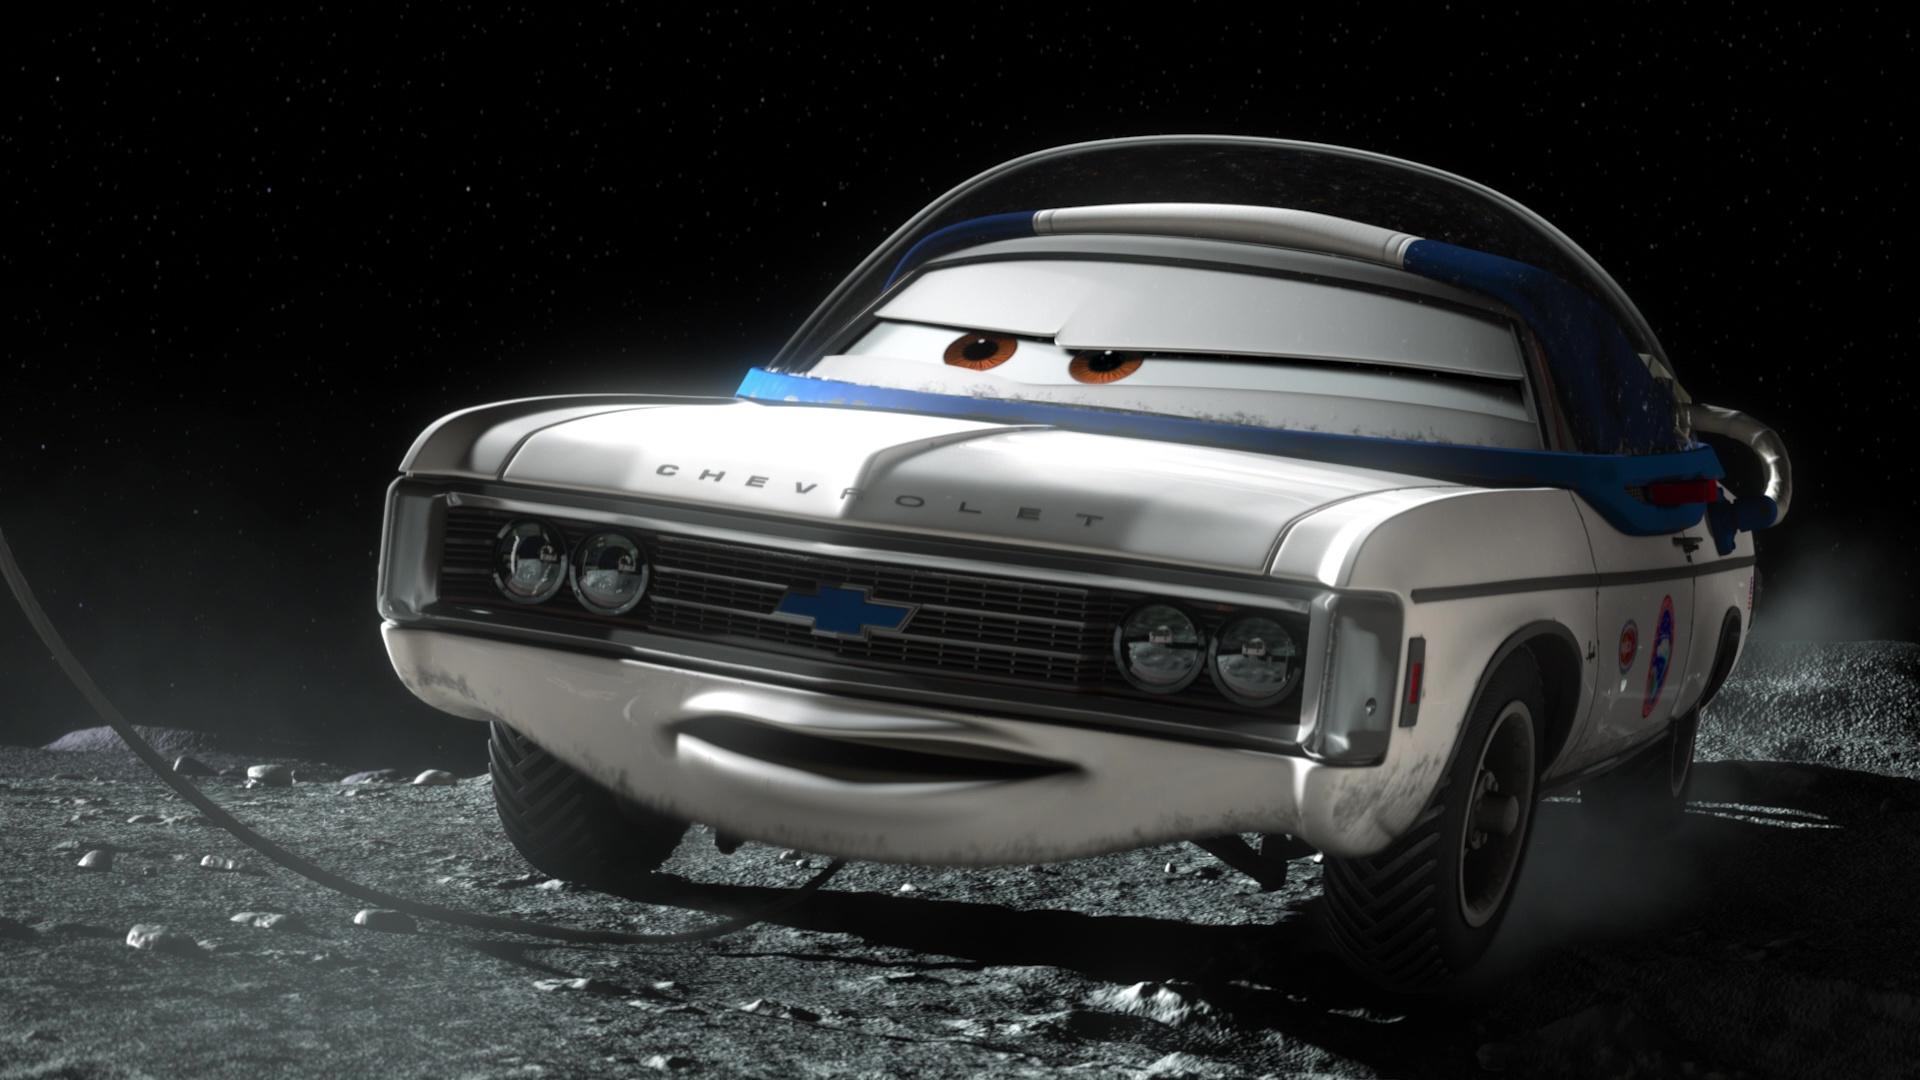 impala-xiii-cars-toon-martin-lunaire-03